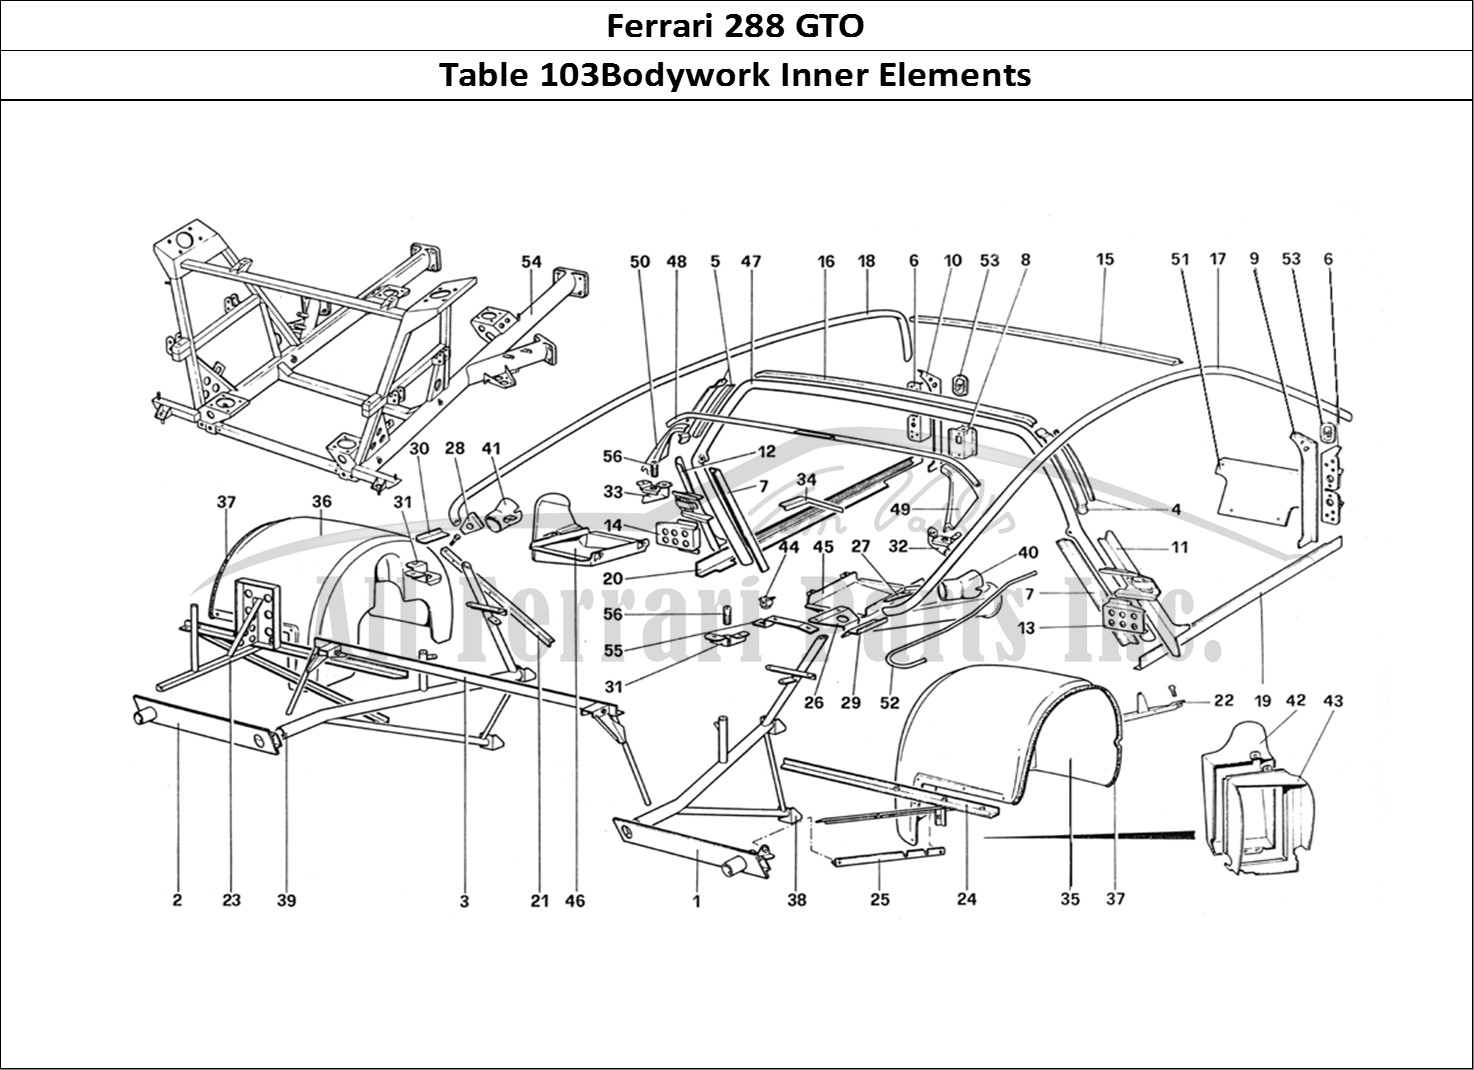 Buy original Ferrari 288 GTO 103Bodywork Inner Elements